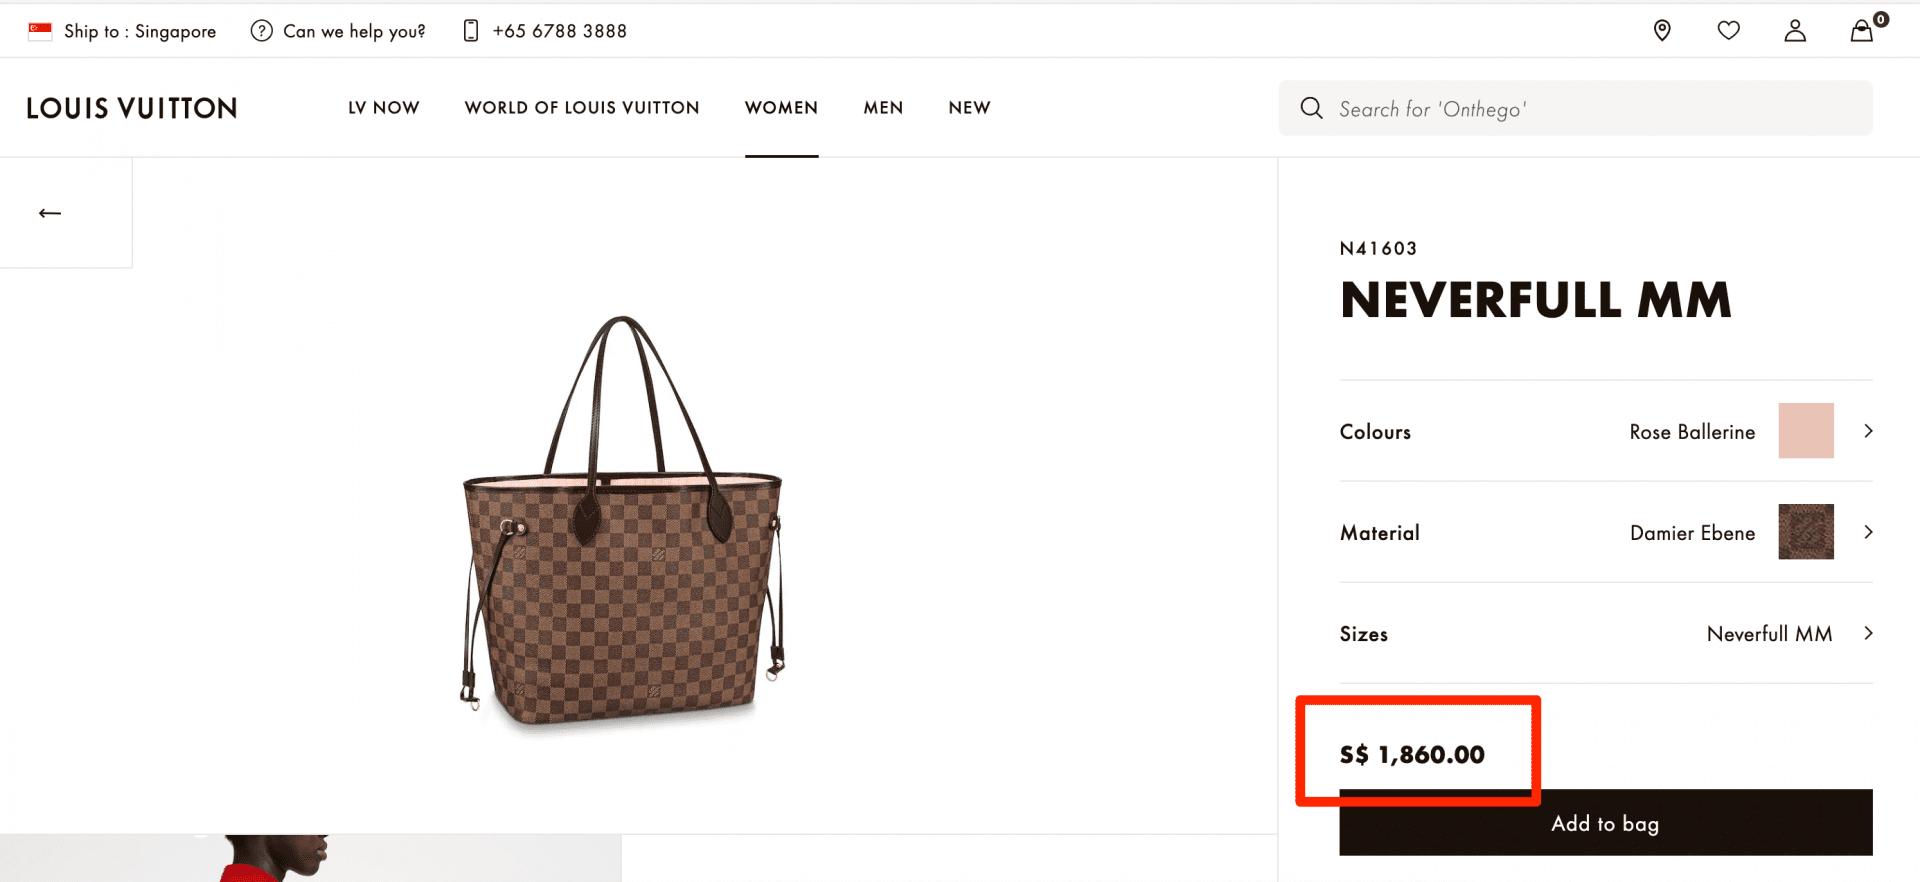 Louis Vuitton neverfull Singapore pricing